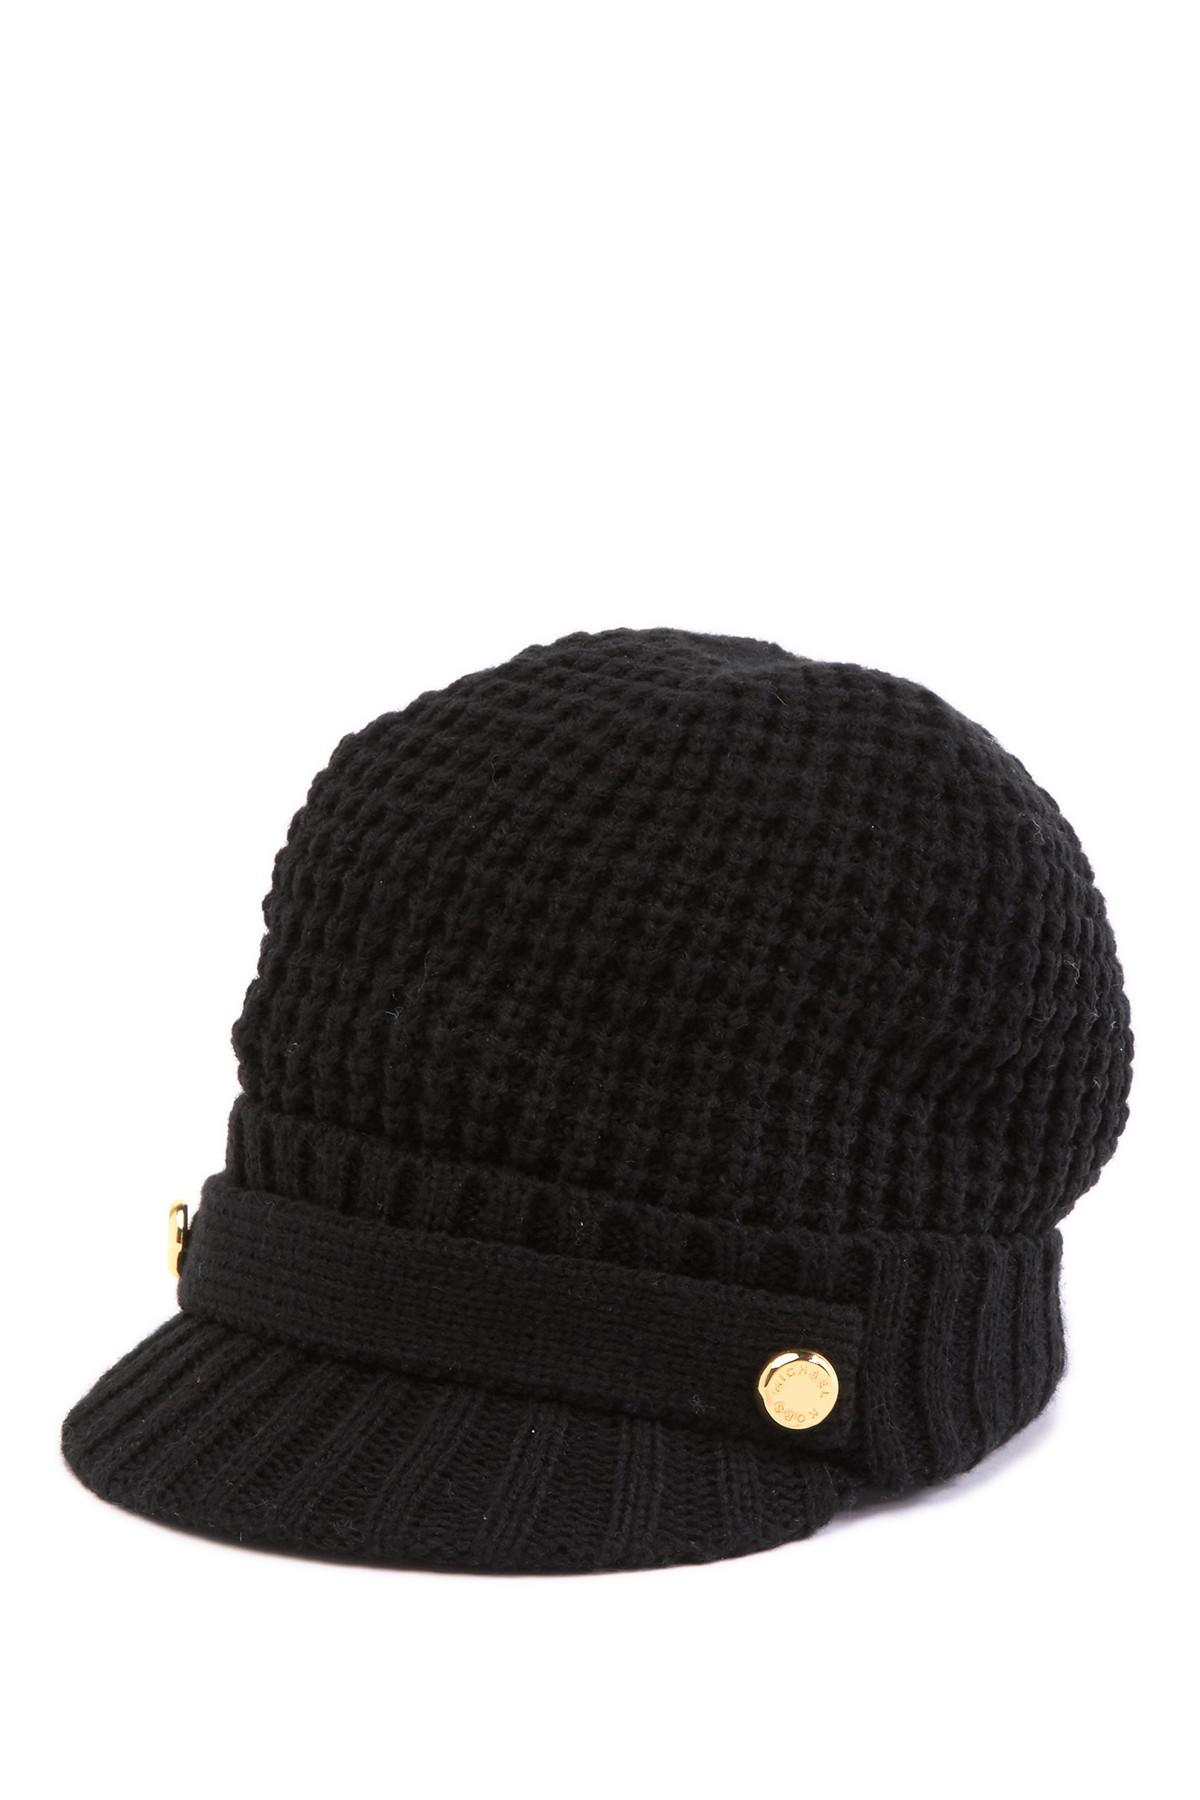 Lyst - Michael Kors Thermal Peak Knit Visor Beanie in Black 31c31b54527